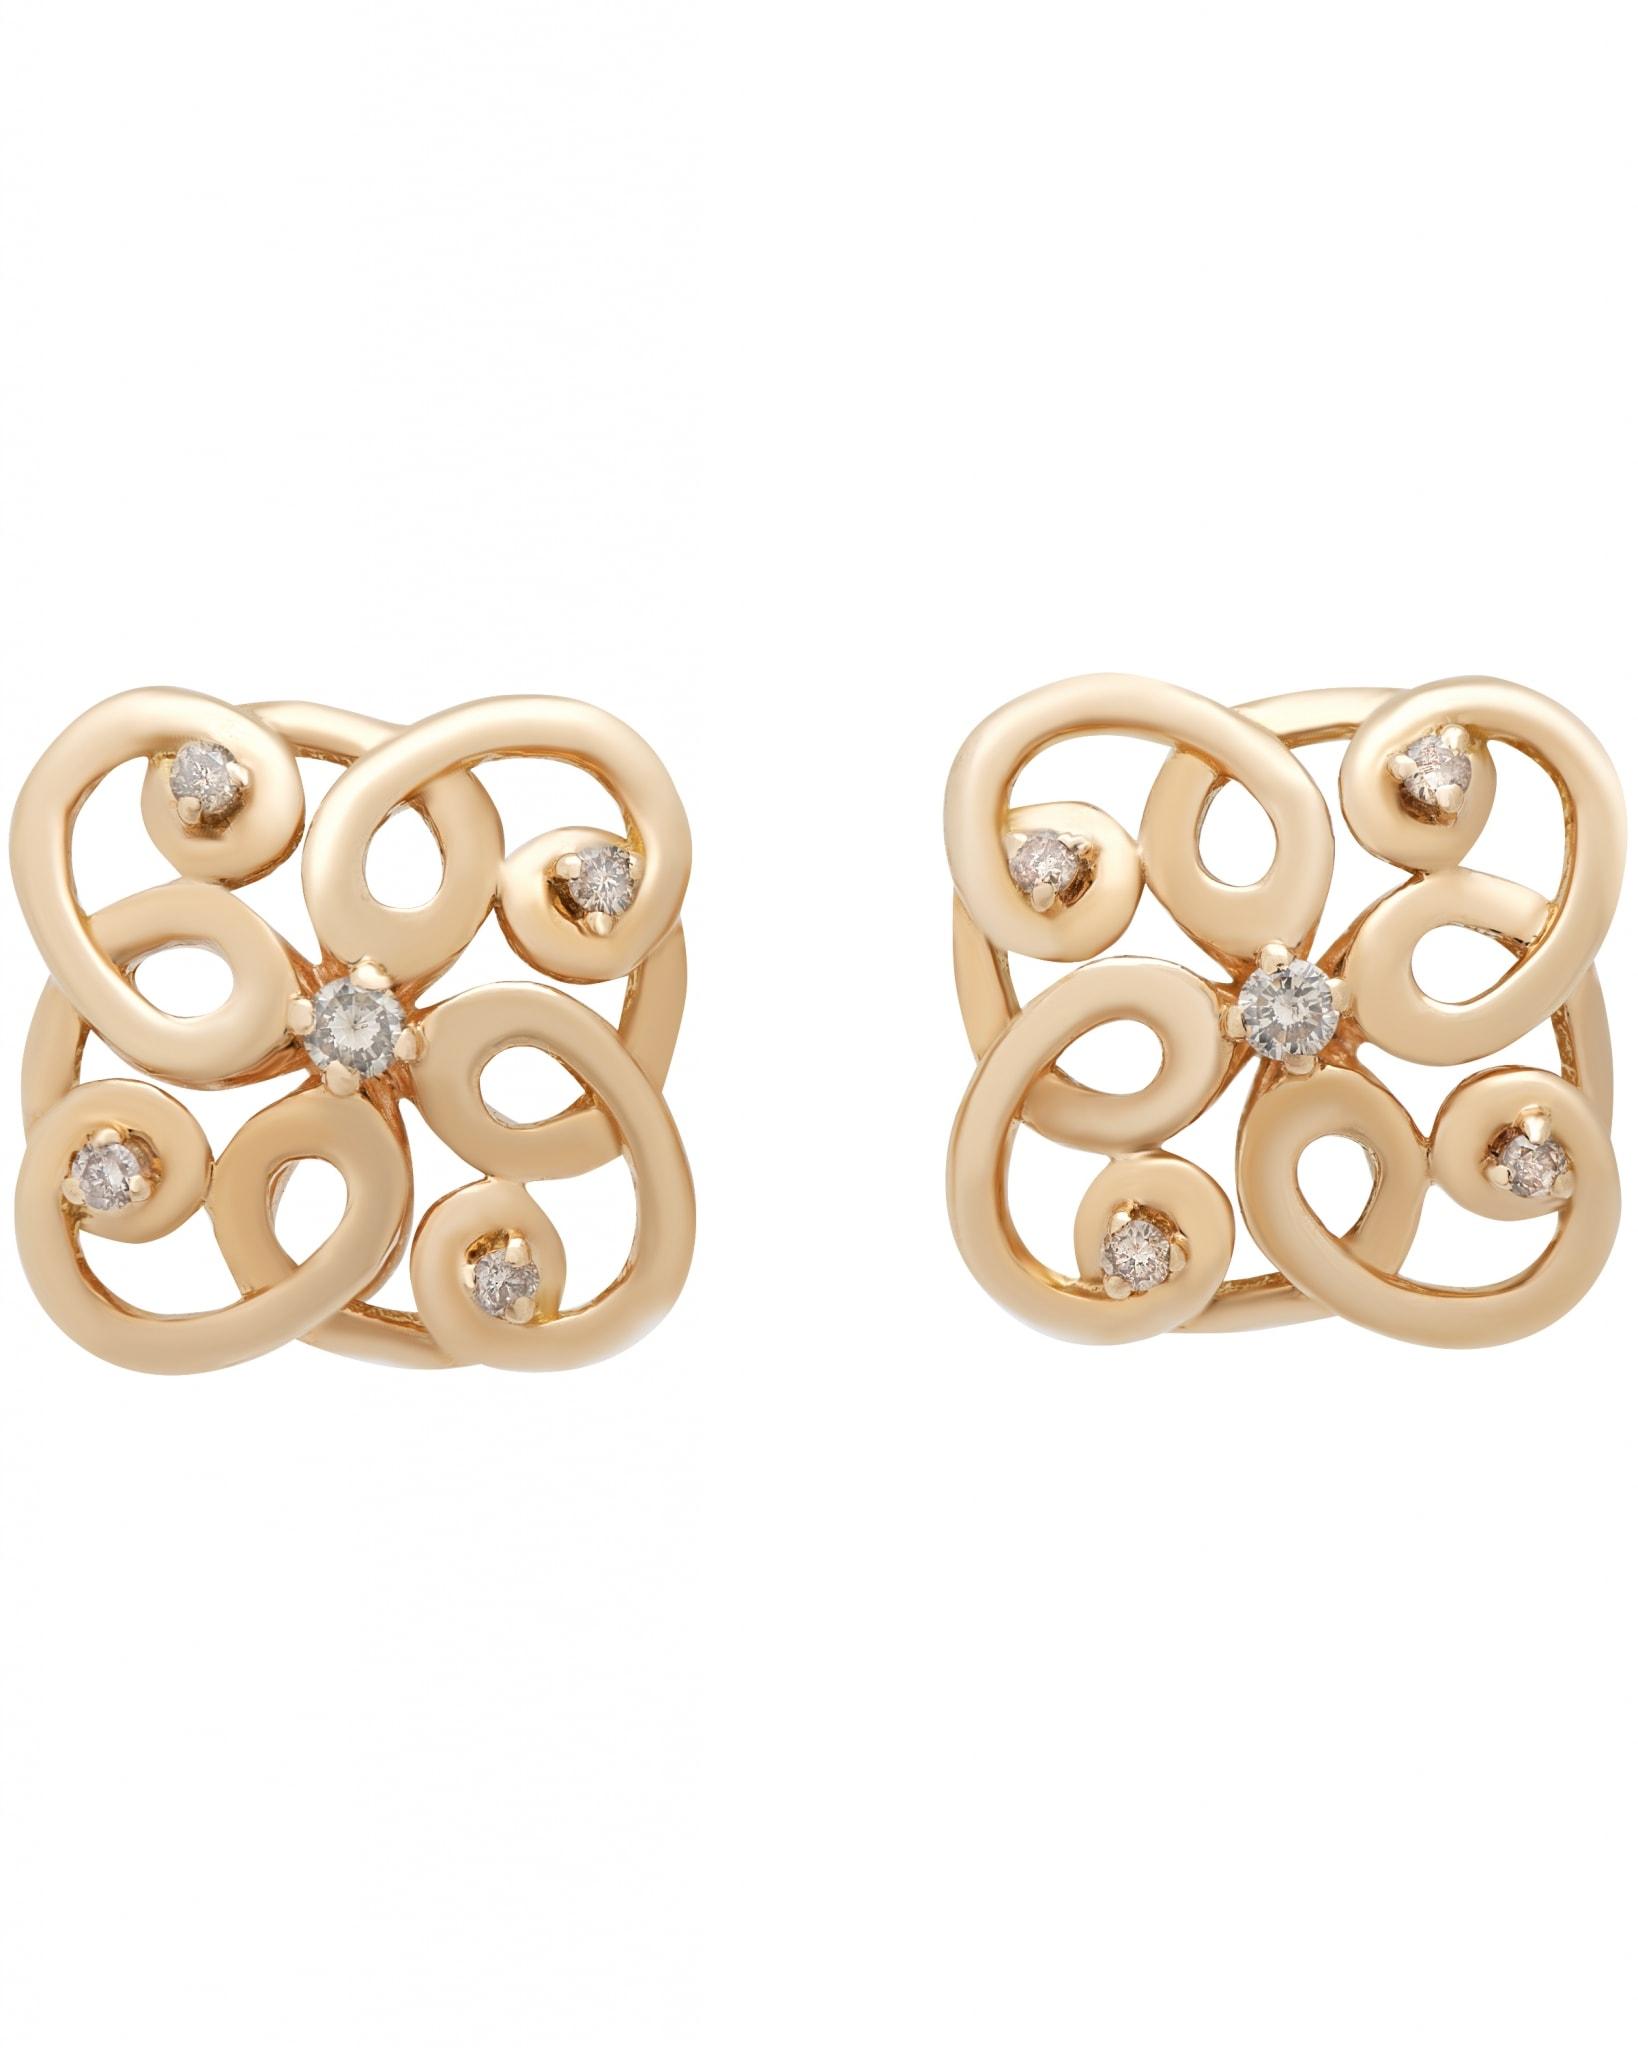 GIANNI LAZZARO – 18K Rose Gold, Diamonds, Earrings 5439